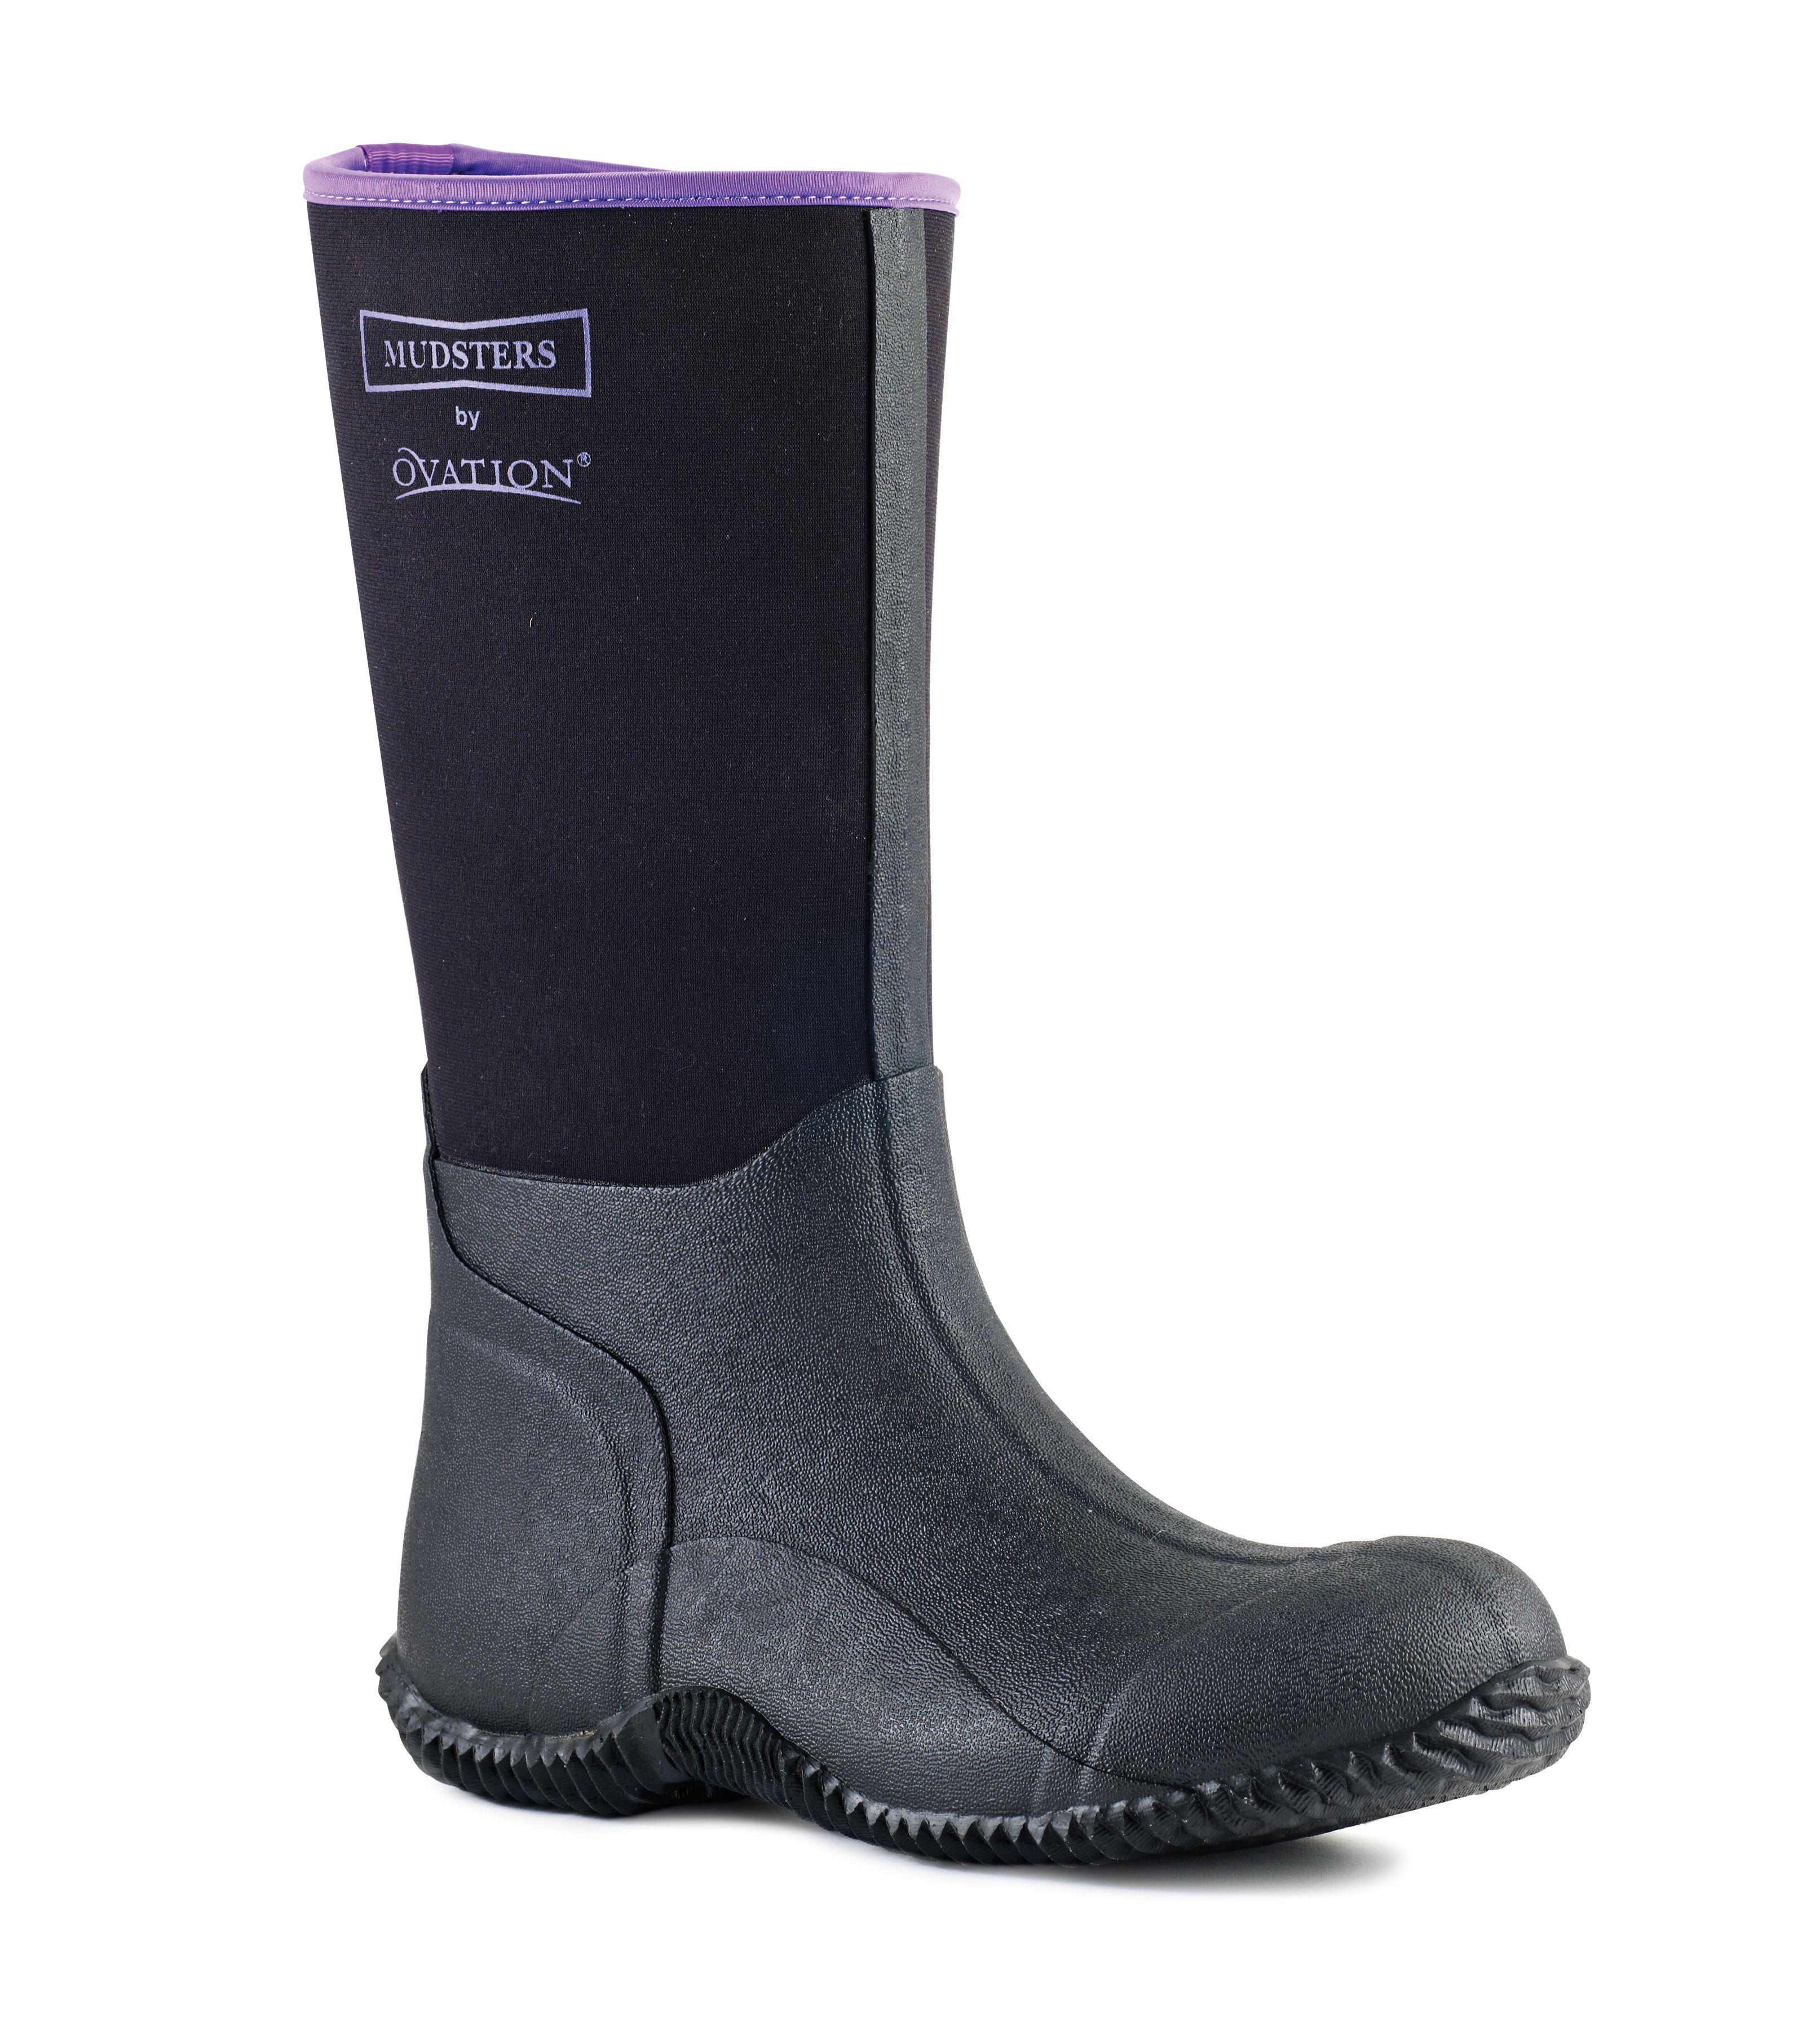 Ovation Ladies' Mudster Tall Barn Boot